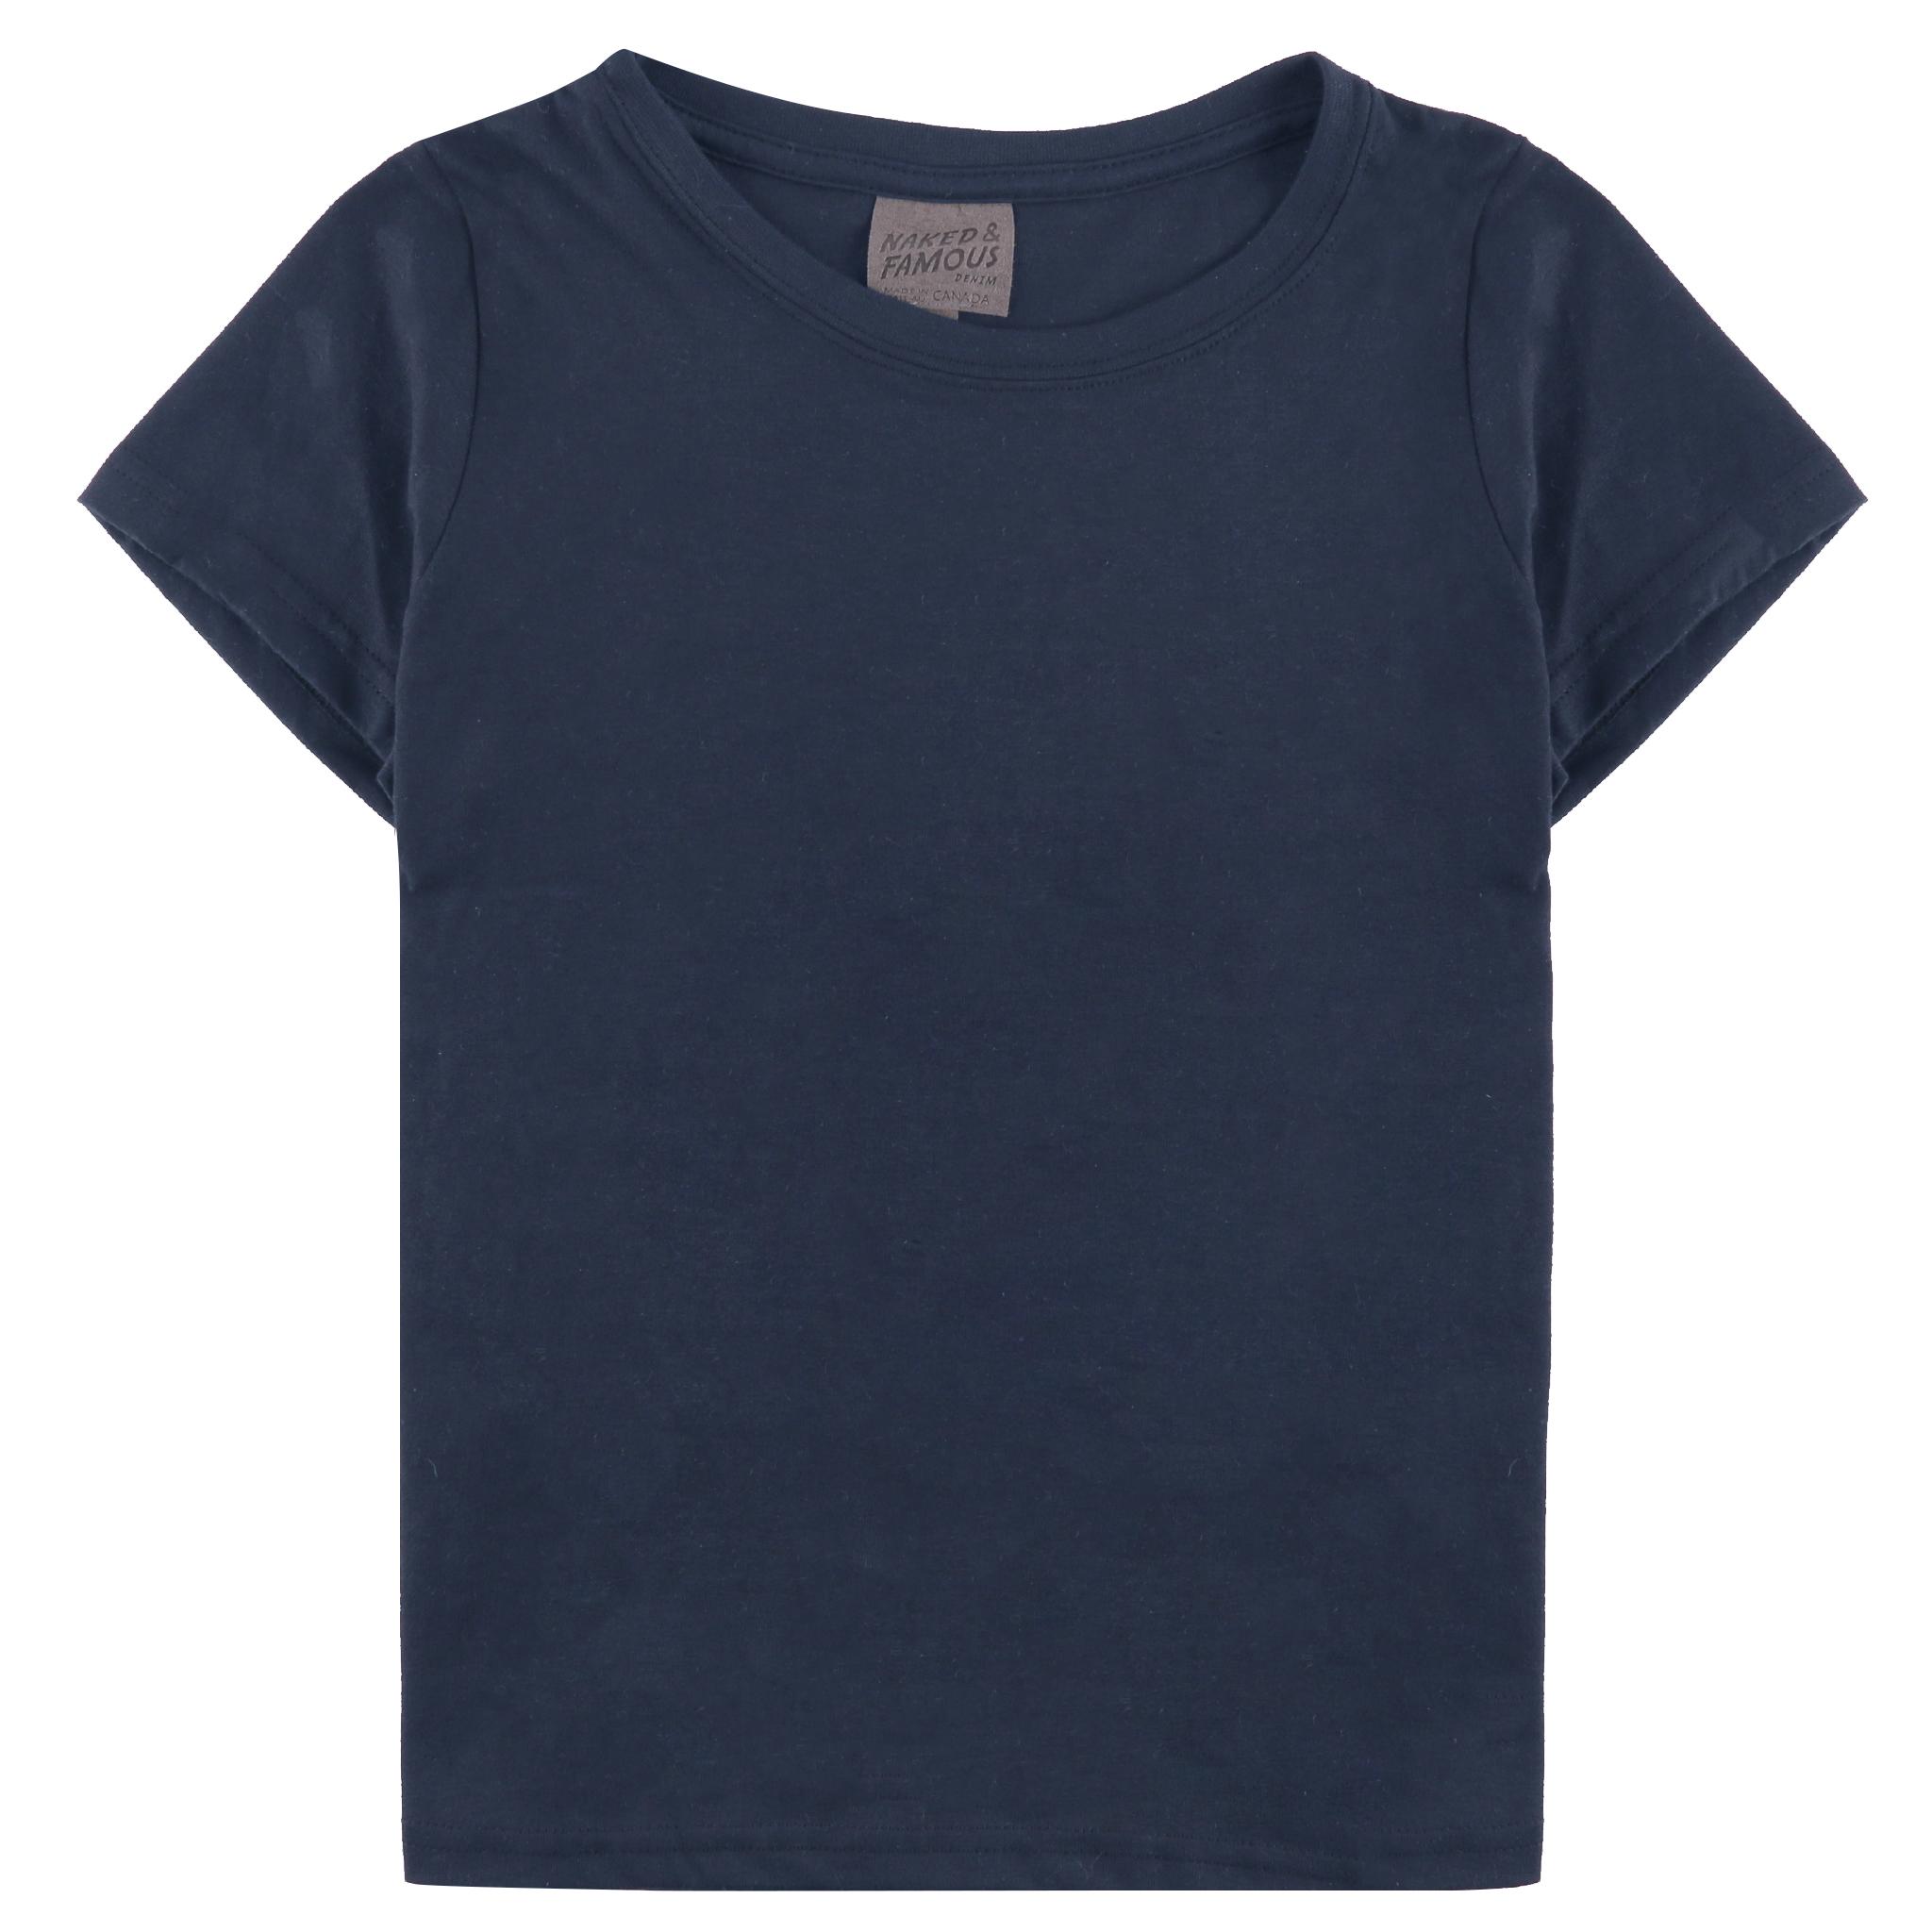 Women's Circular Knit T-shirt Navy Flat View